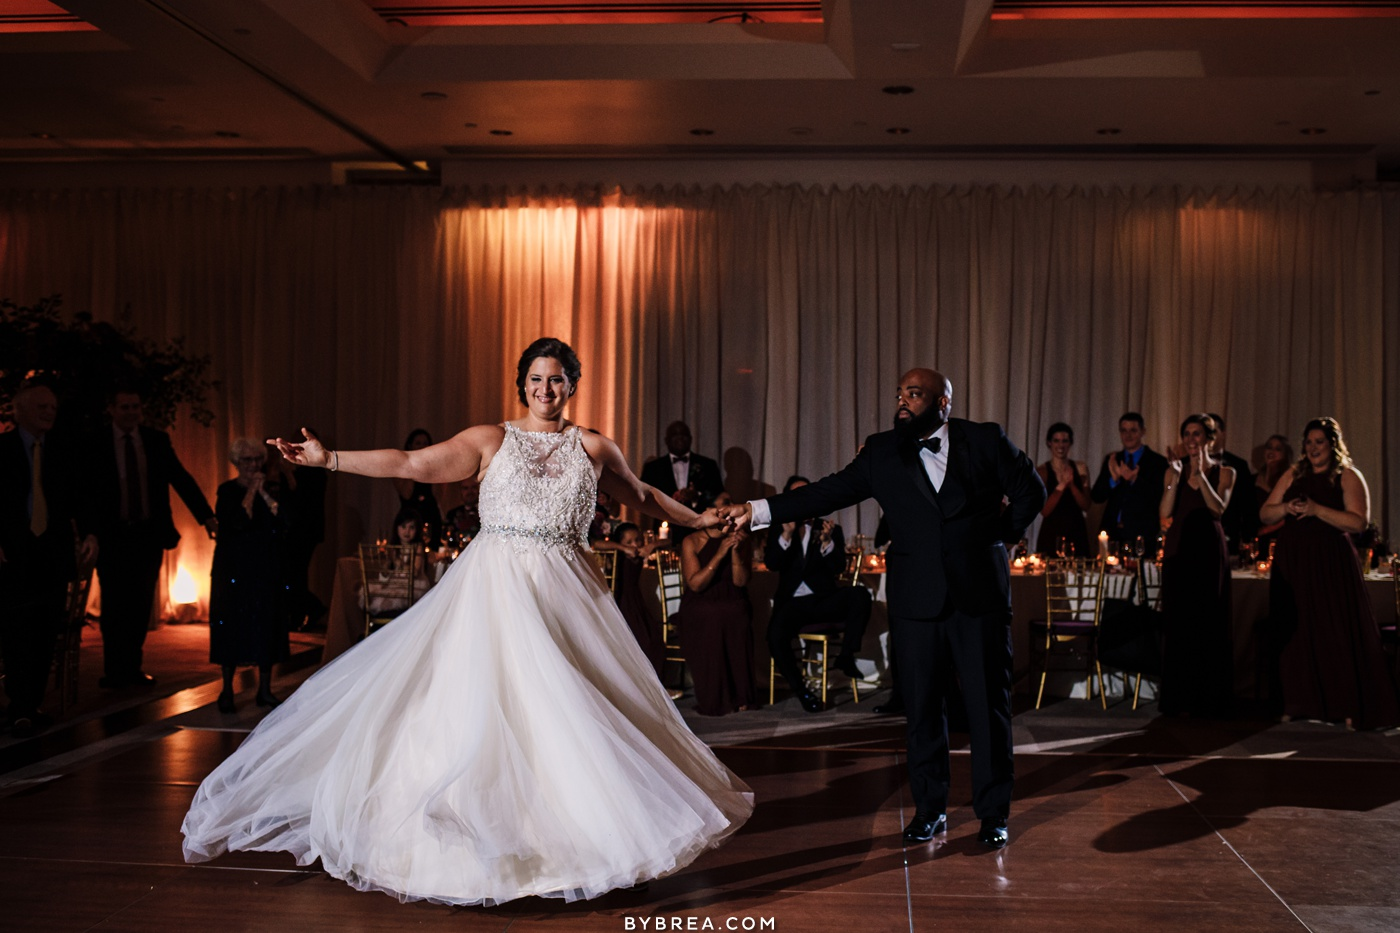 Park Hyatt wedding first dance bride and groom Washington wedding